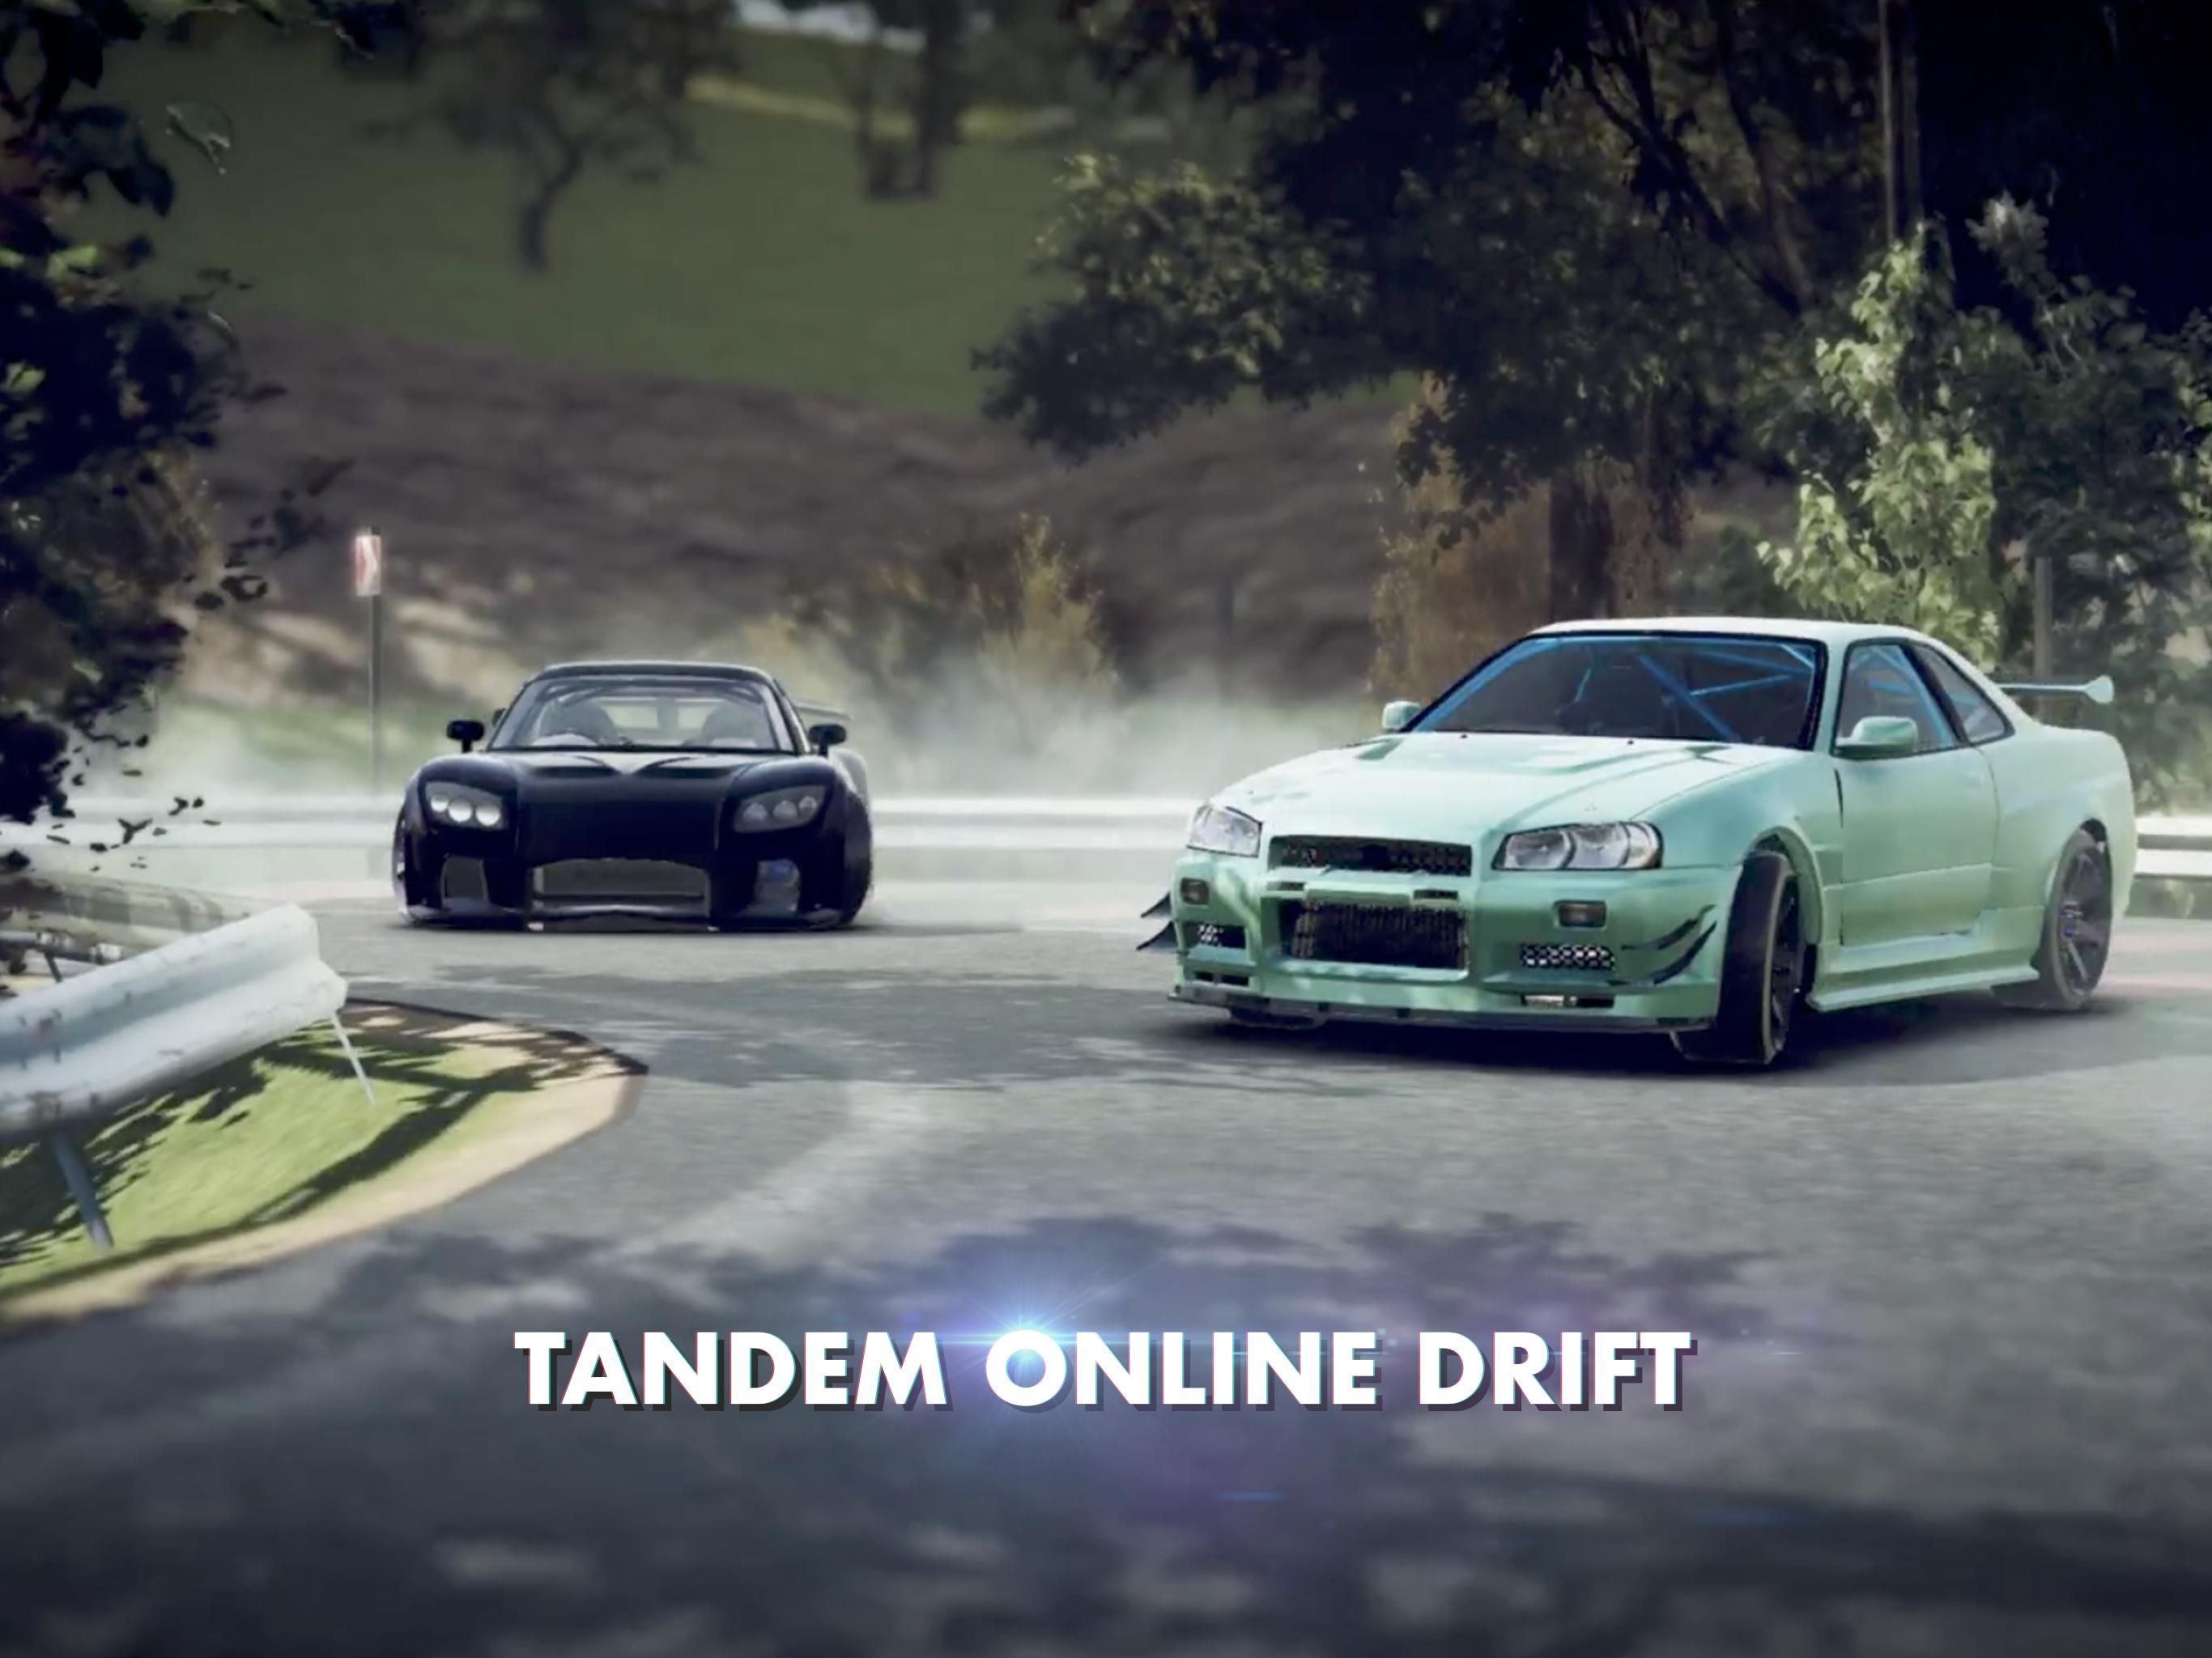 Hashiriya Drifter #1 Racing 1.4.5 Screenshot 12